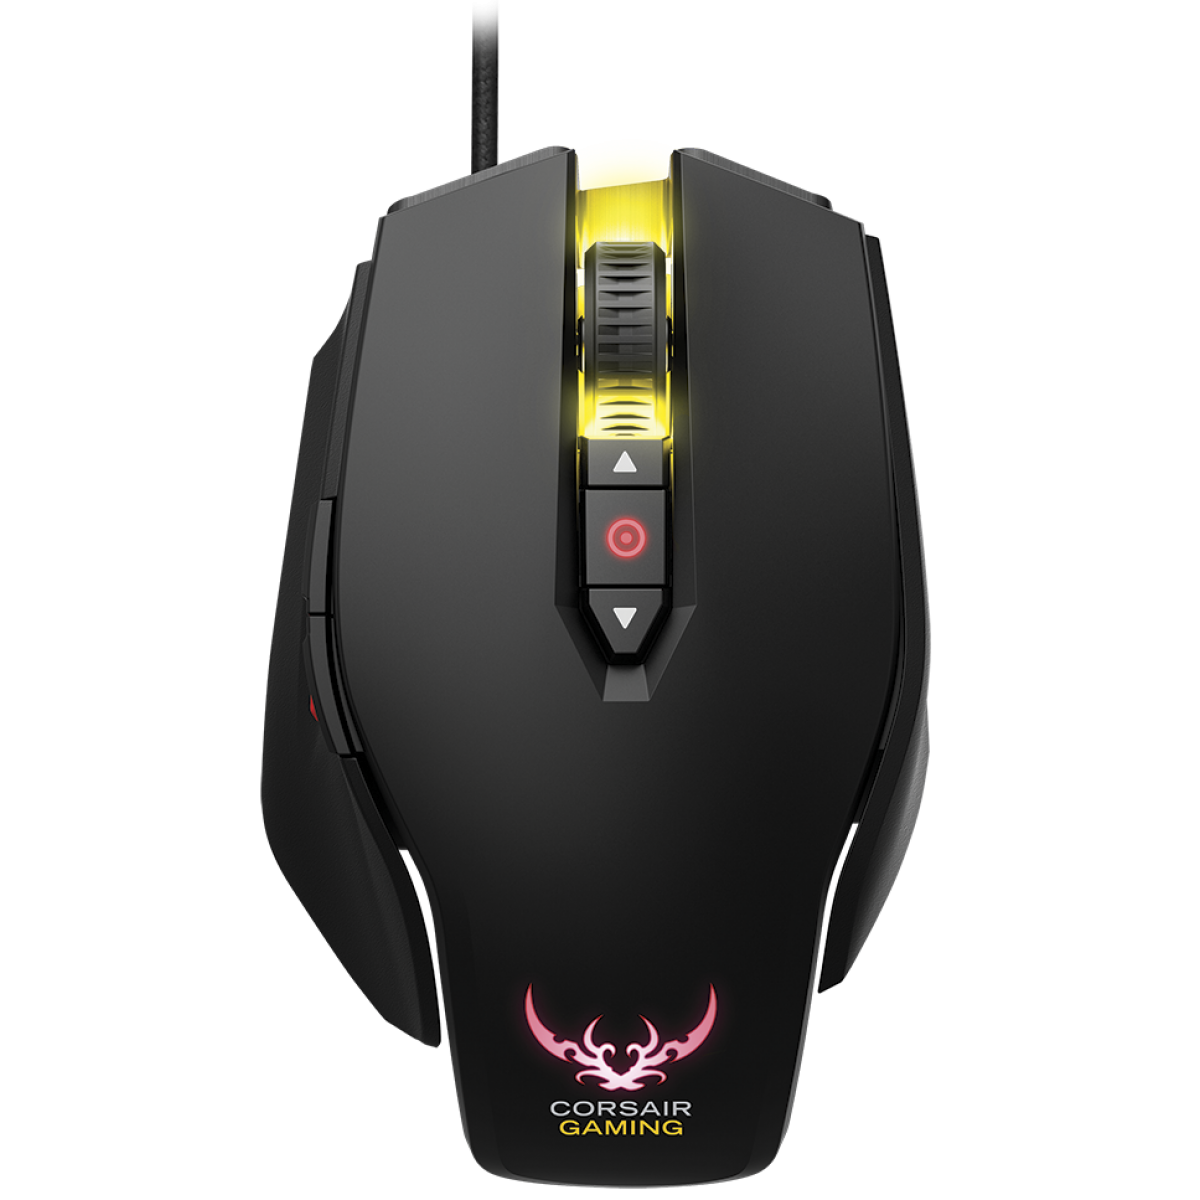 Mouse Corsair Gaming M65 Laser RGB CH-9000070-NA 8 Botões 8200 DPI Black